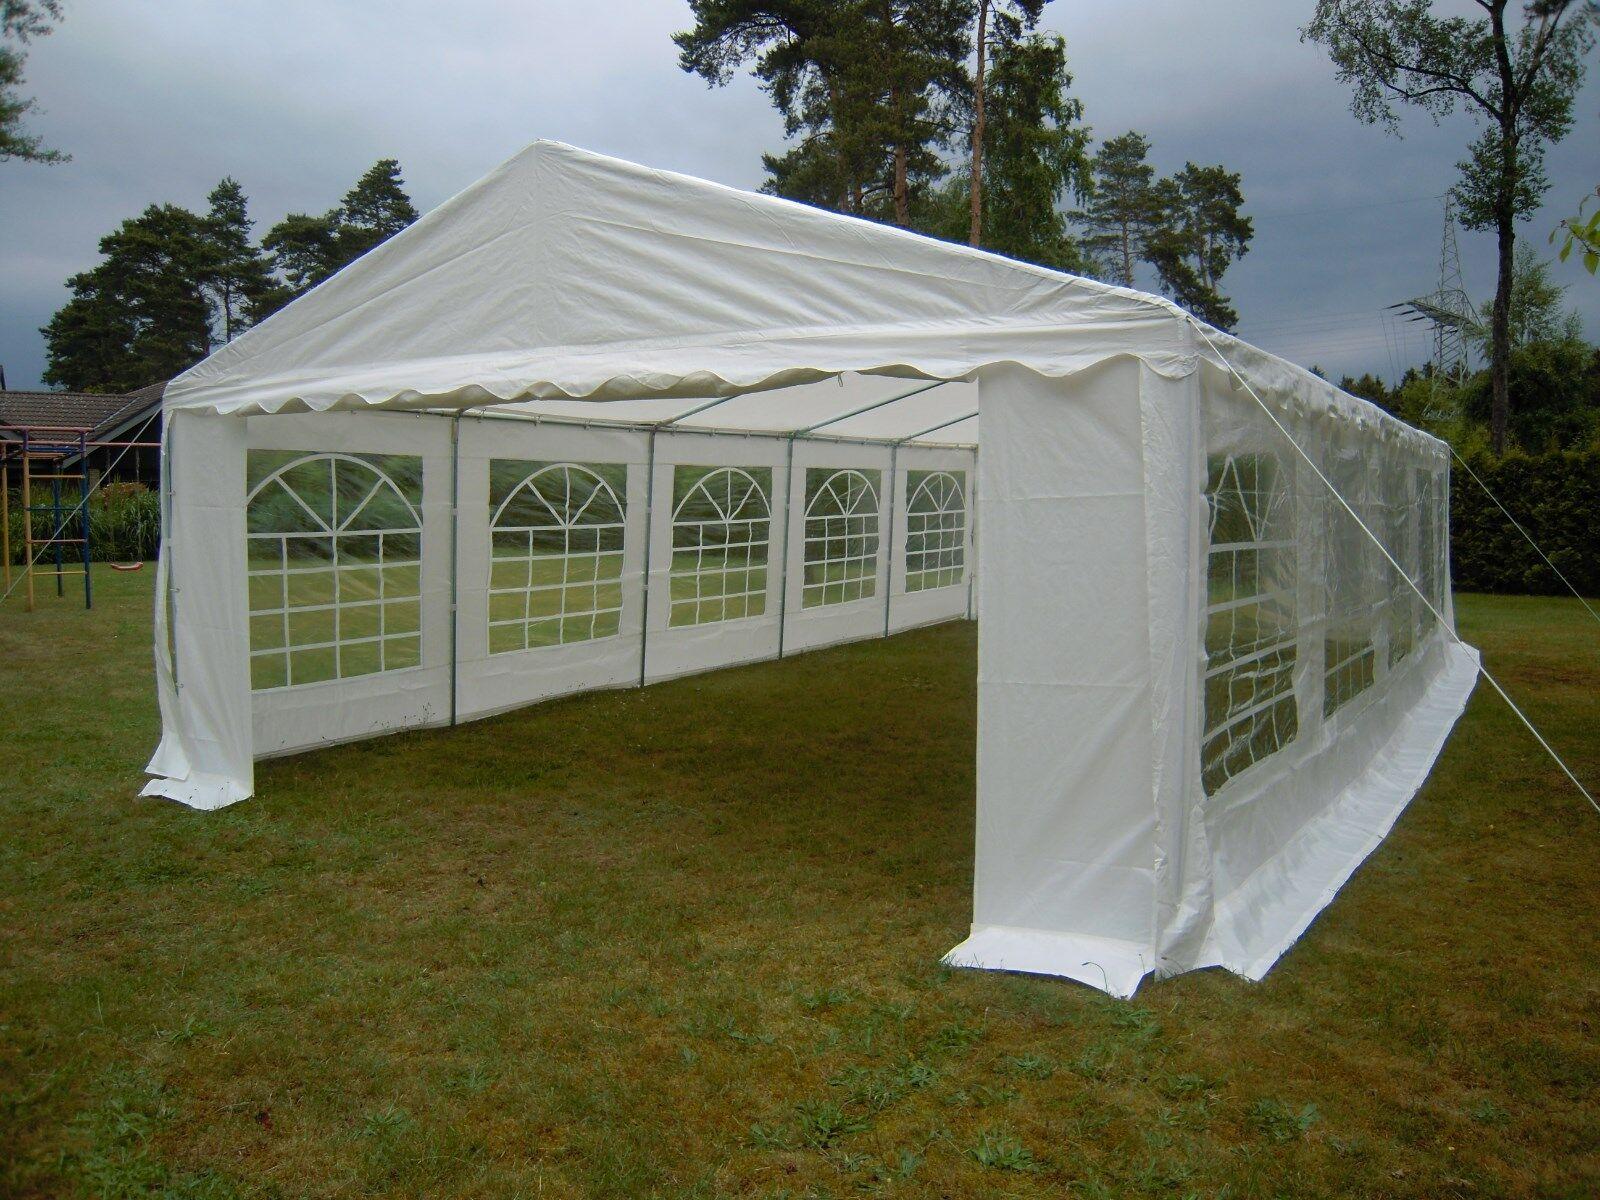 Partyzelt 5x10 m Pavillon PE Gartenzelt Zelt Vereinszelt Vereinszelt Vereinszelt Bierzelt Neu | Haltbarer Service  | Neuer Stil  | Berühmter Laden  888d16